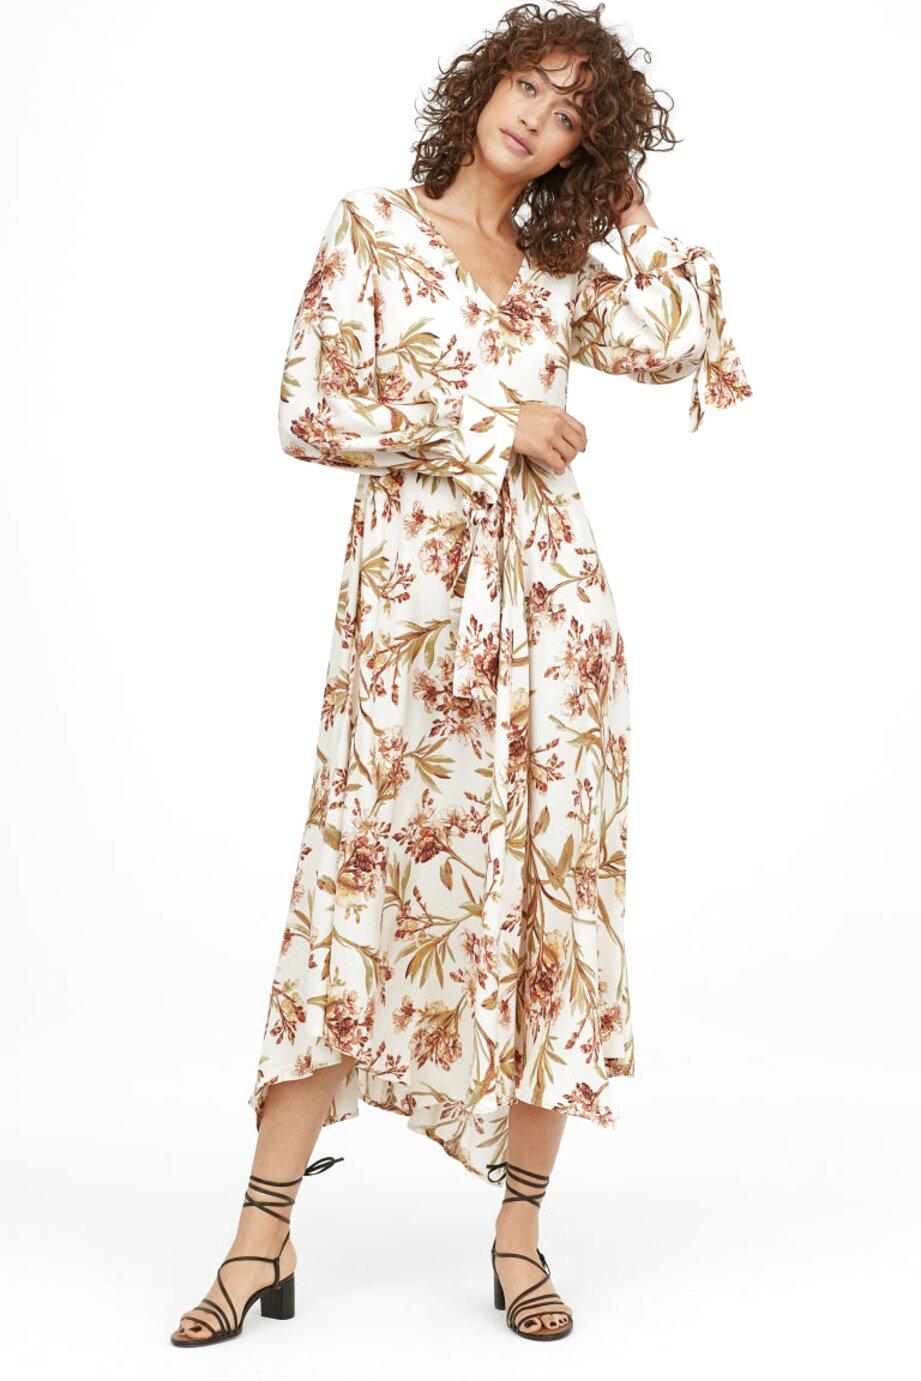 h m floral dress for sale